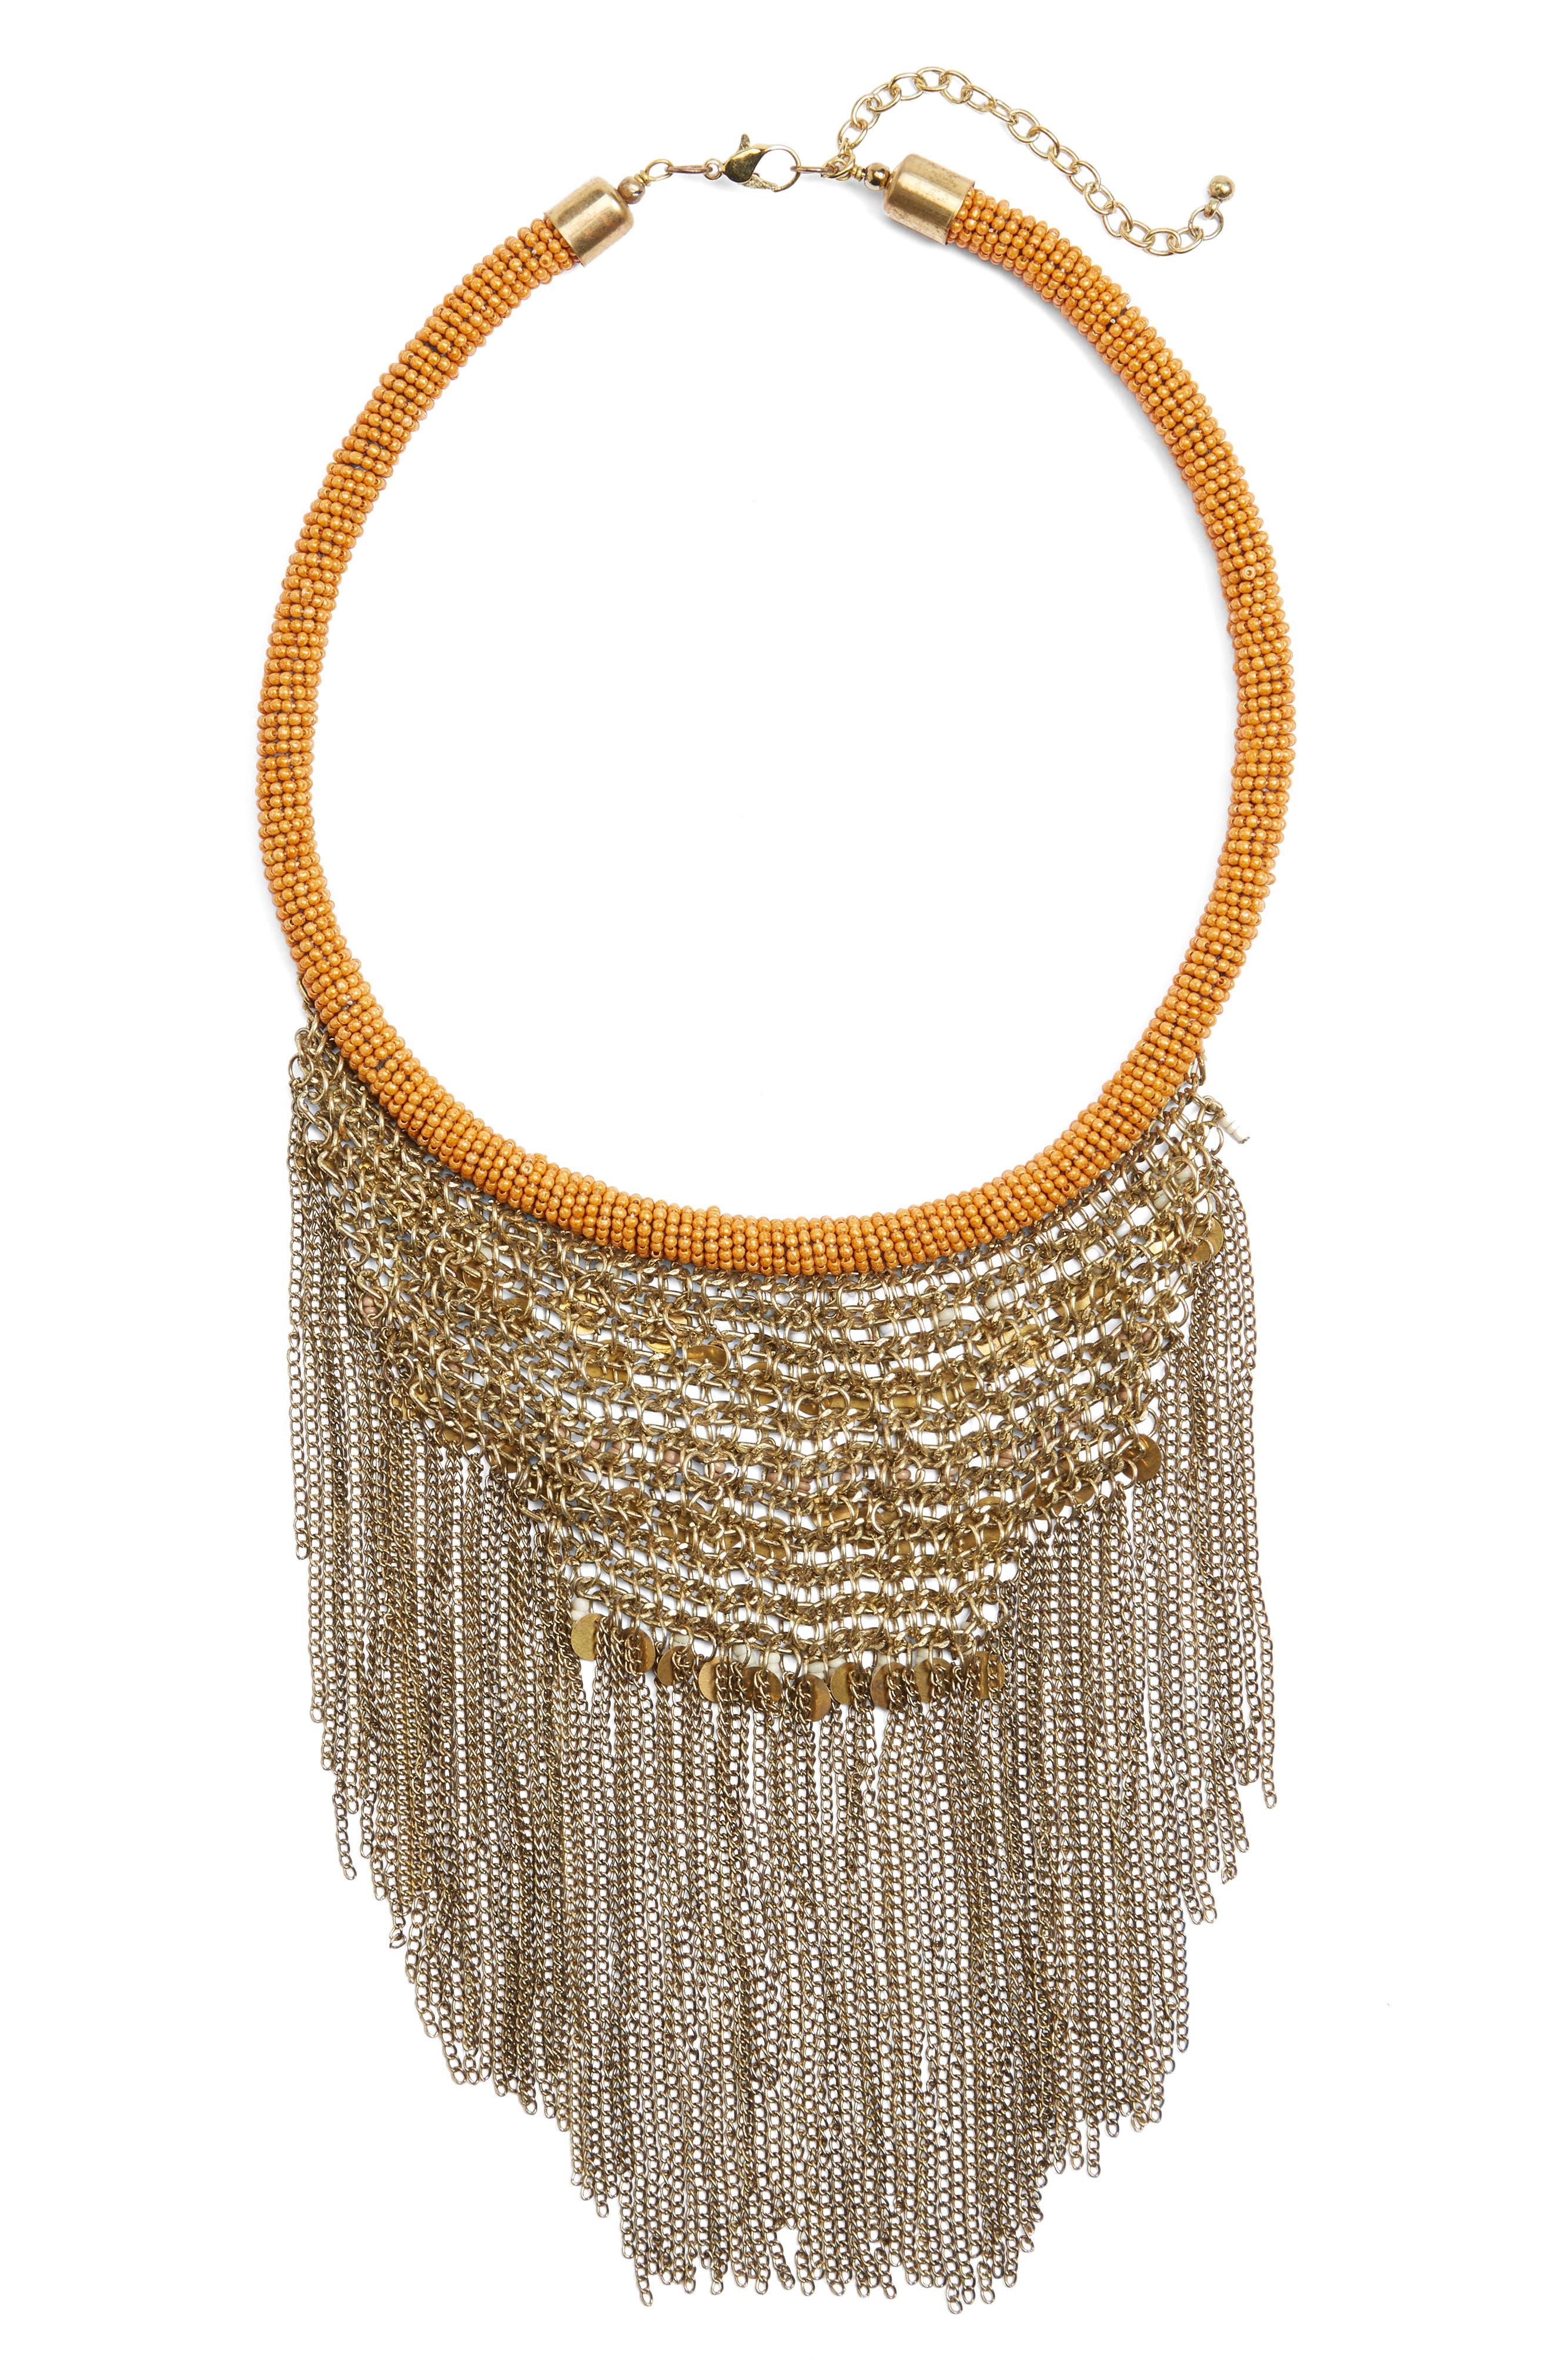 Panacea Antique Fringe Bib Necklace